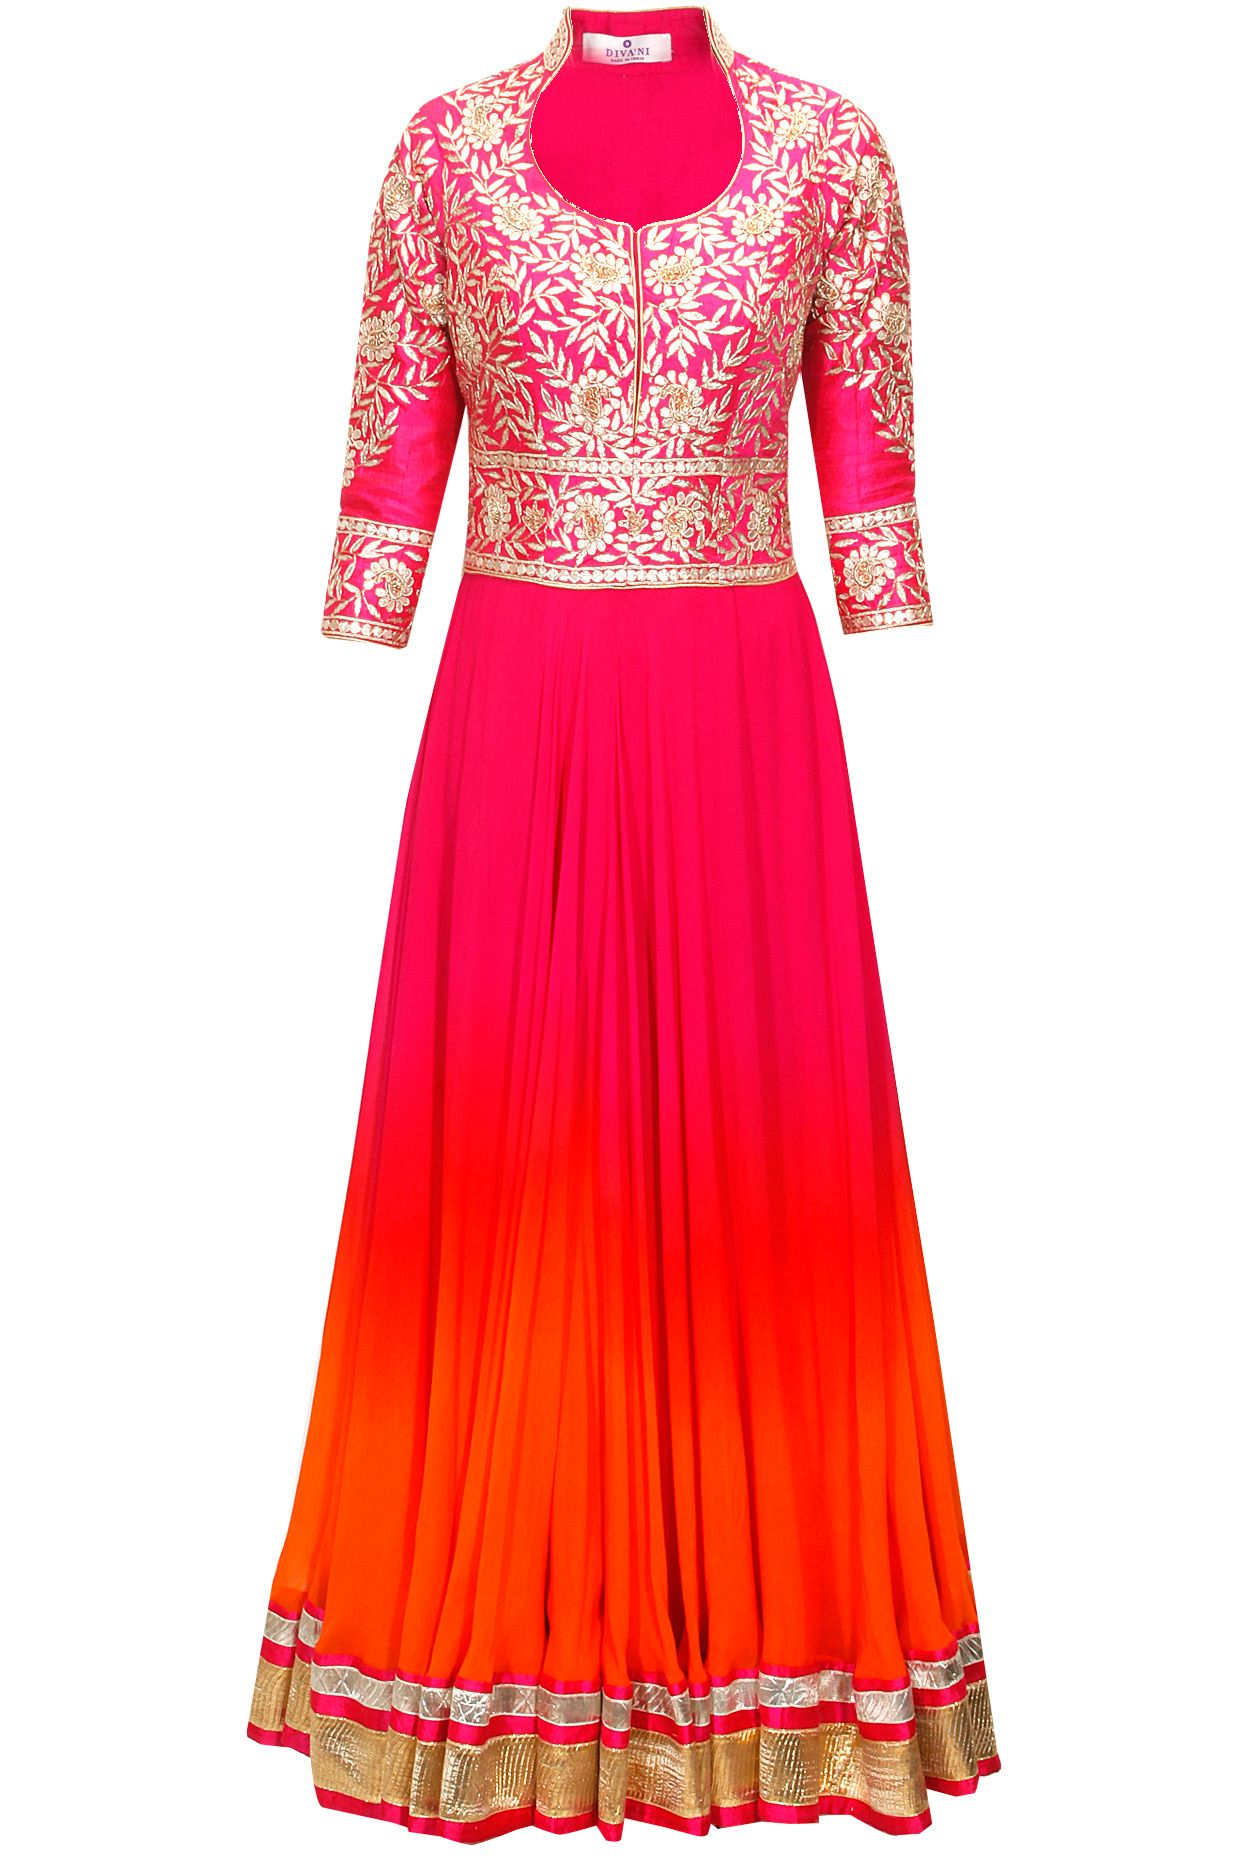 Divani Pink and orange gotta embroidered anarkali set available only ...